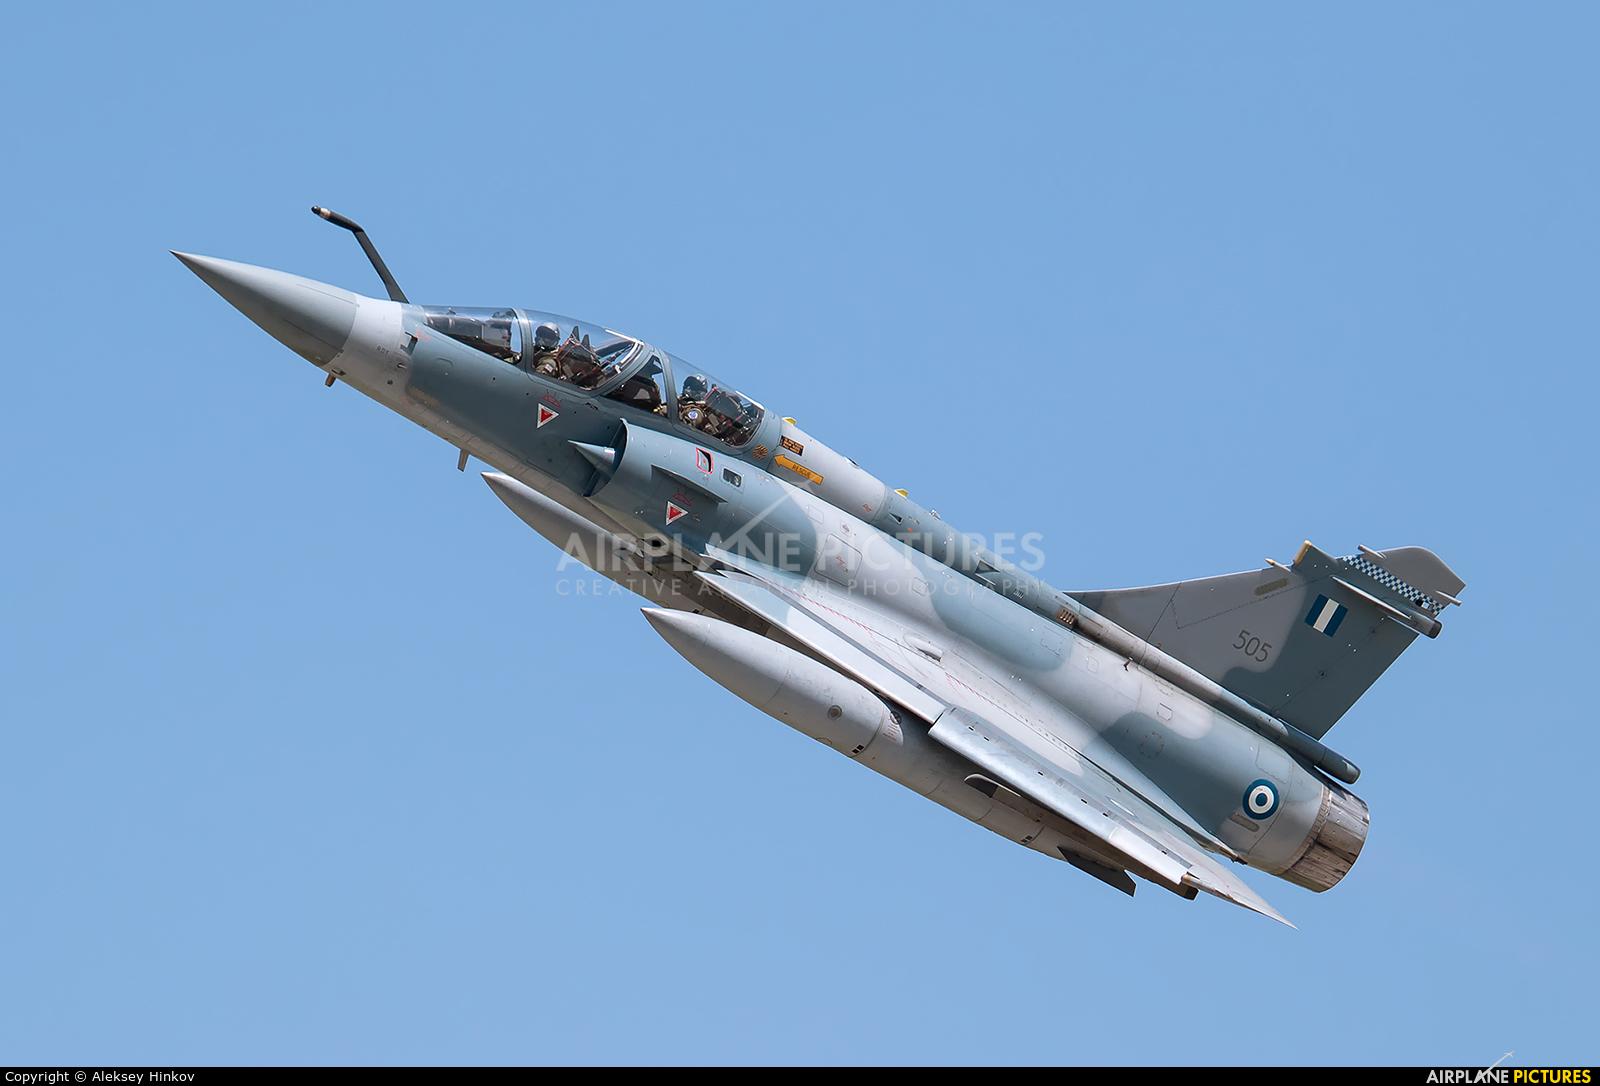 Greece - Hellenic Air Force 505 aircraft at Larissa